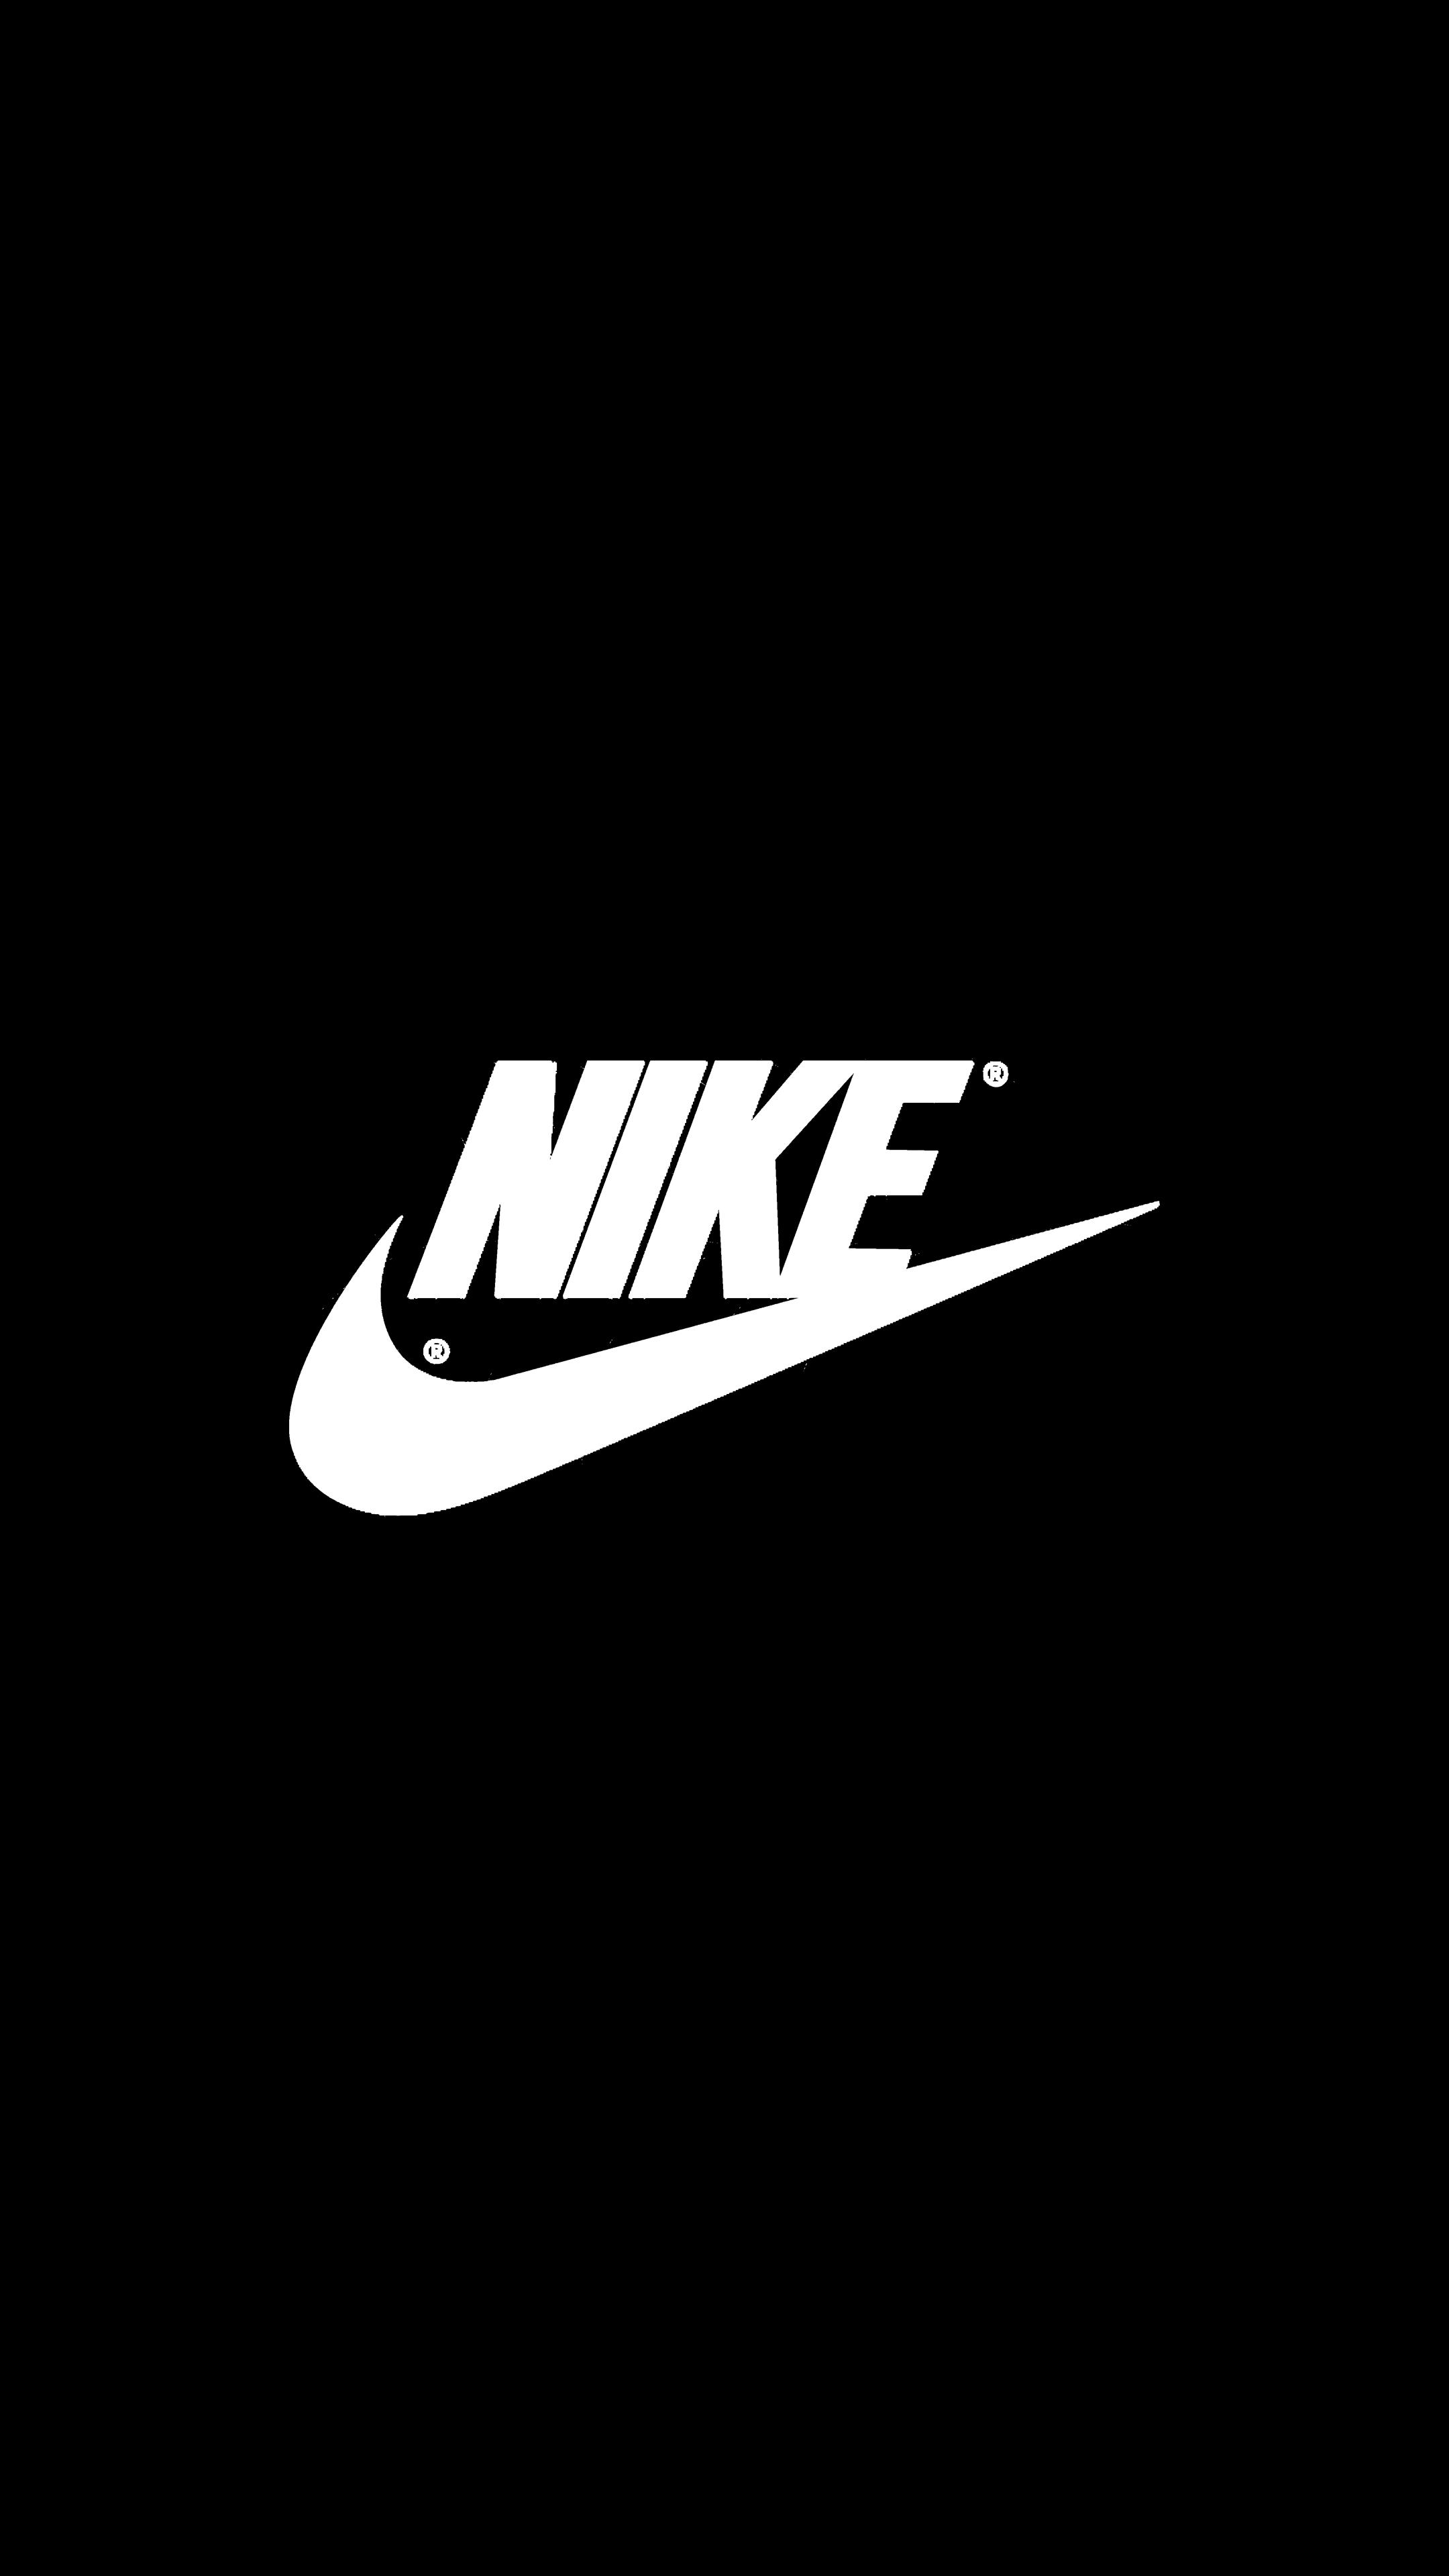 Nike 2160p 4k Oled Wallpaper Papel De Parede Da Nike Papel De Parede Supreme Papel De Parede Vaporwave